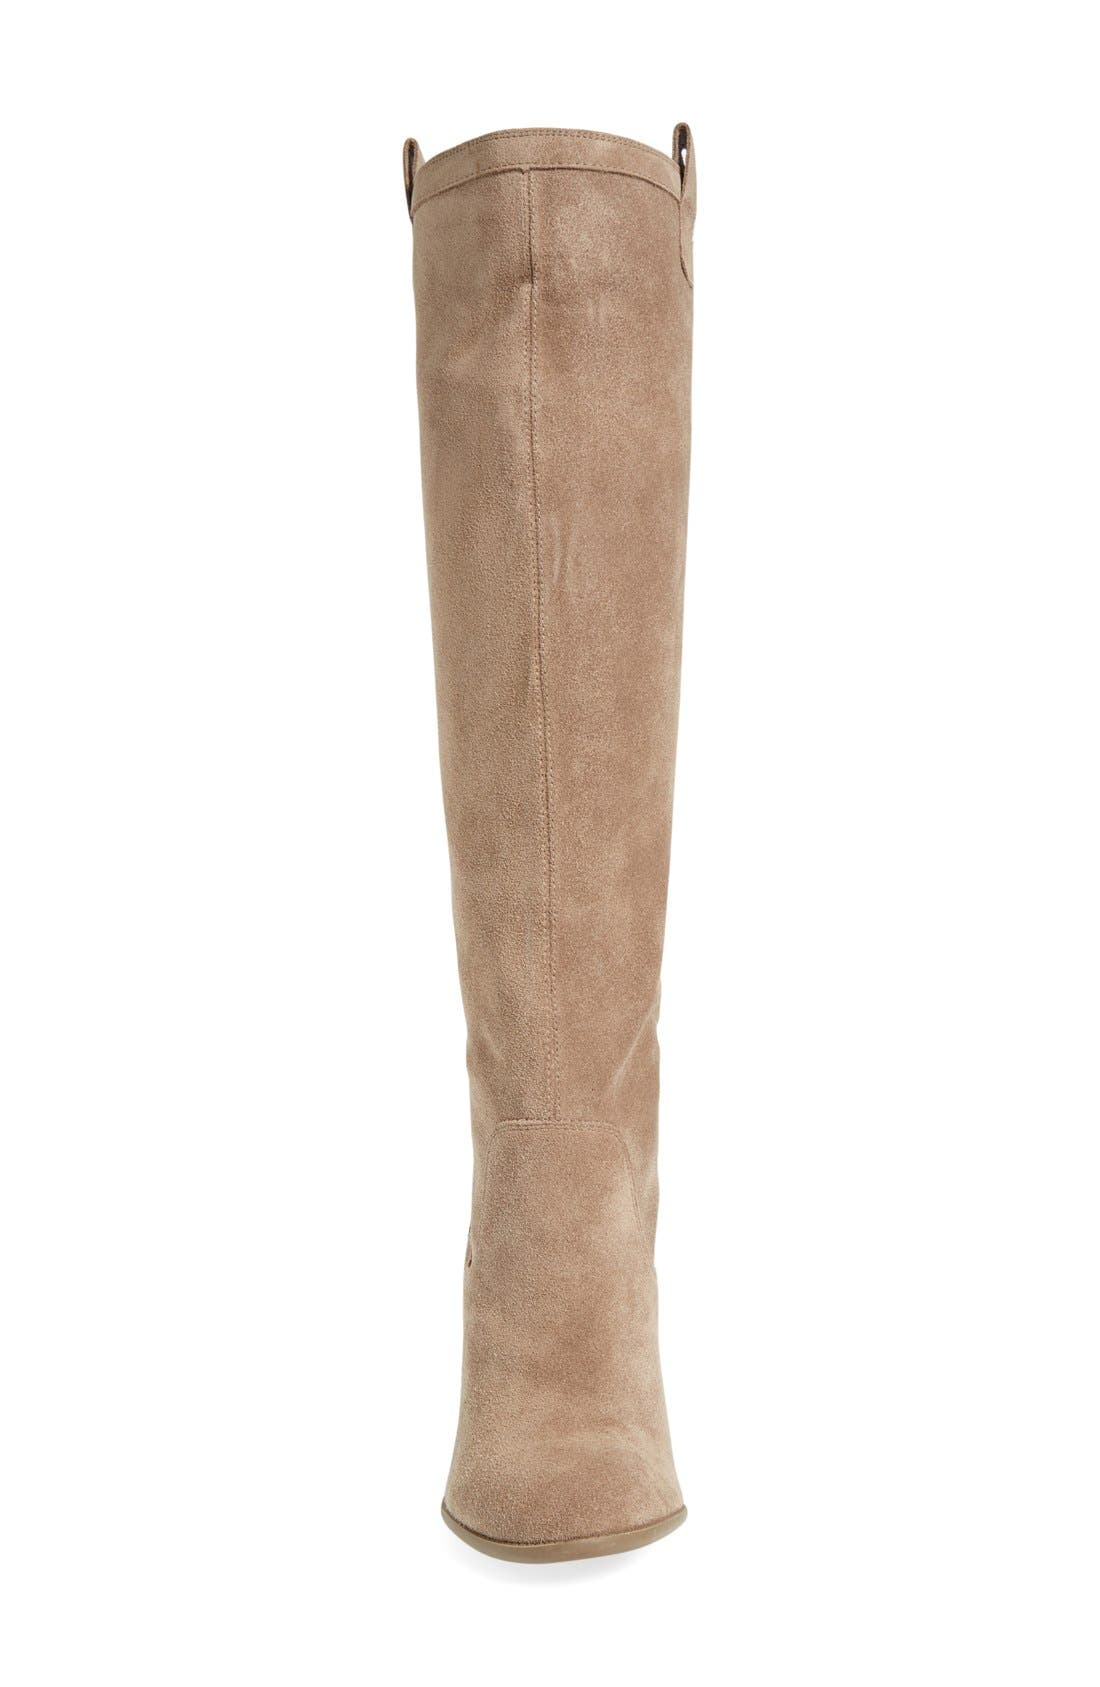 Alternate Image 3  - Sole Society 'Rumer' Slouchy Knee High Boot (Women)